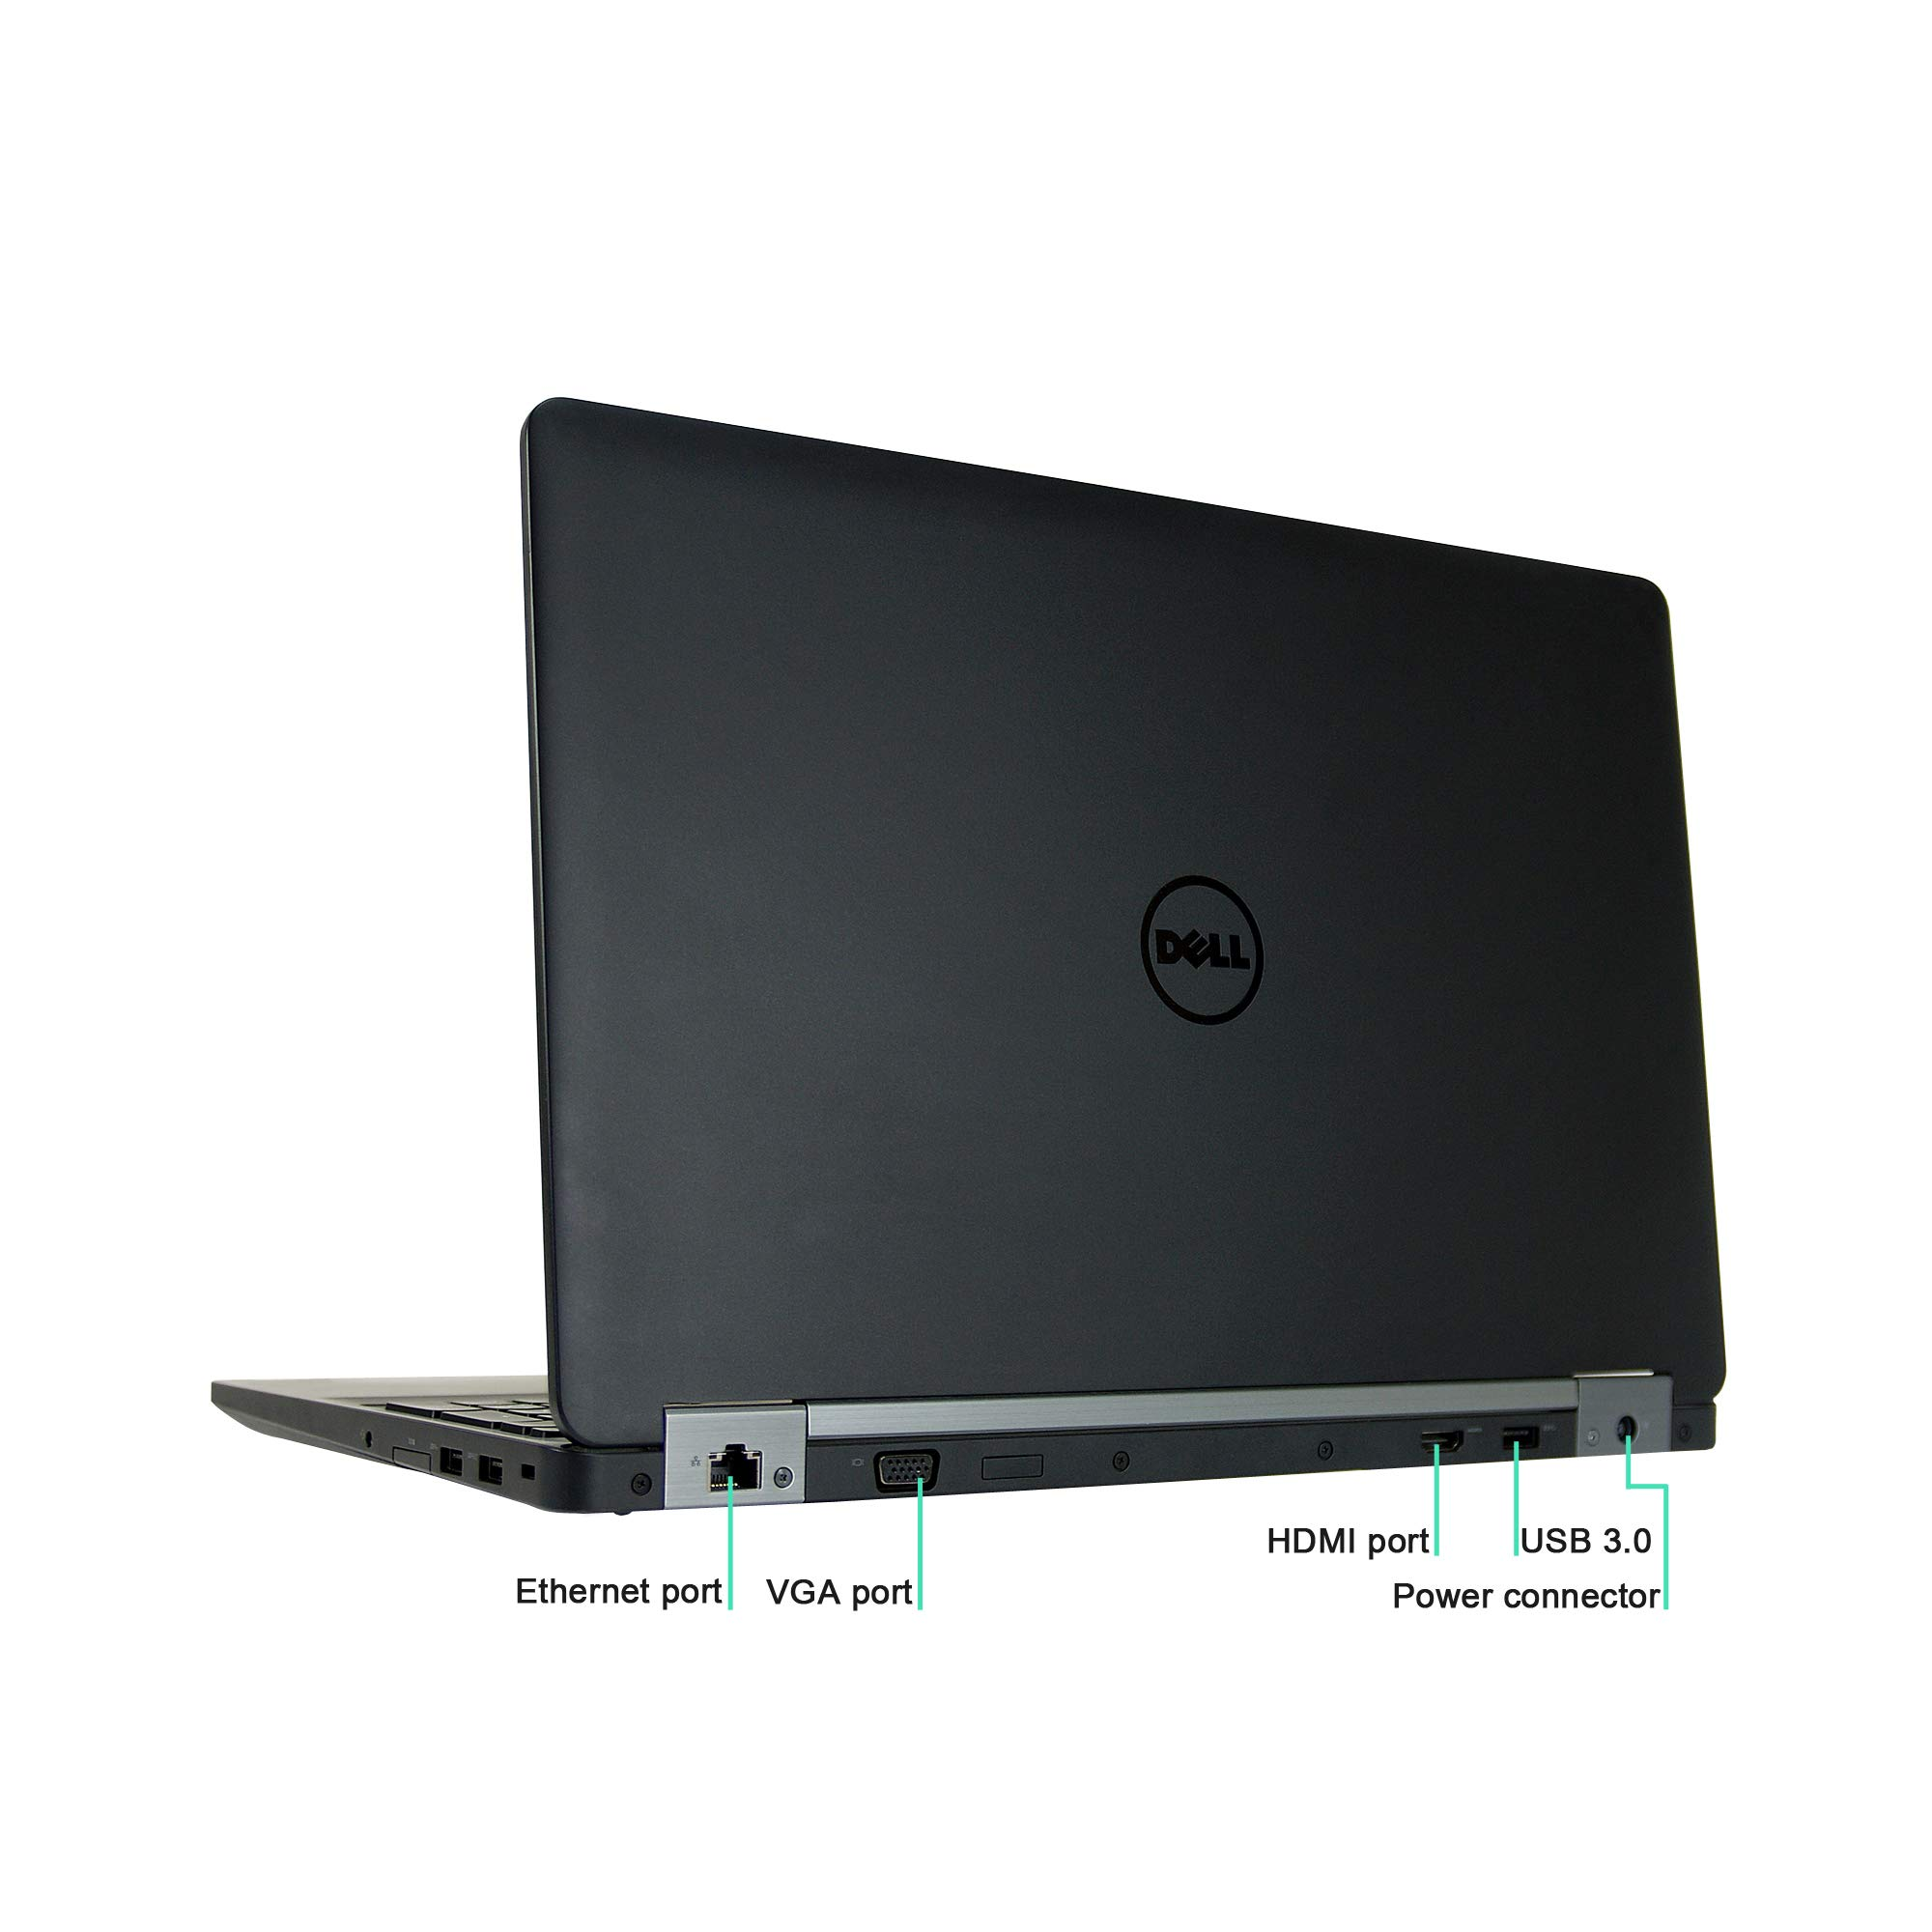 Dell Latitude E5570 15.6in Laptop, Core i5-6300U 2.4GHz, 8GB Ram, 256GB SSD, Windows 10 Pro 64bit (Renewed)